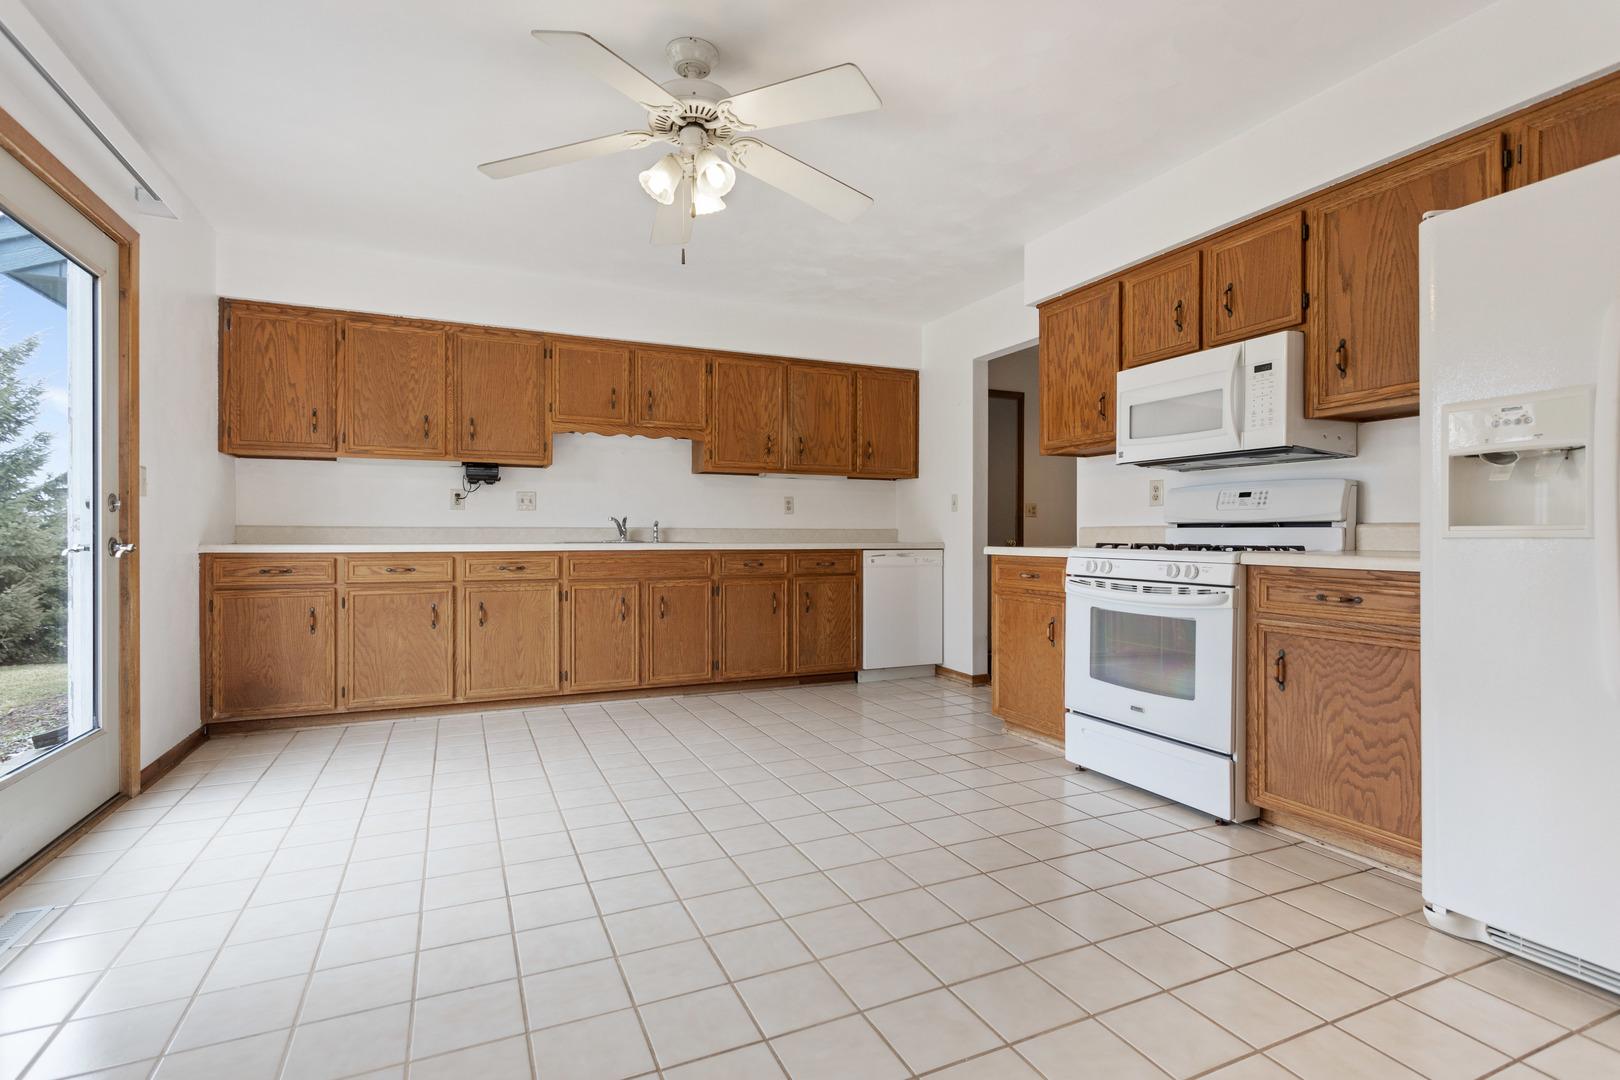 103 North West Seminole, Poplar Grove, Illinois, 61065